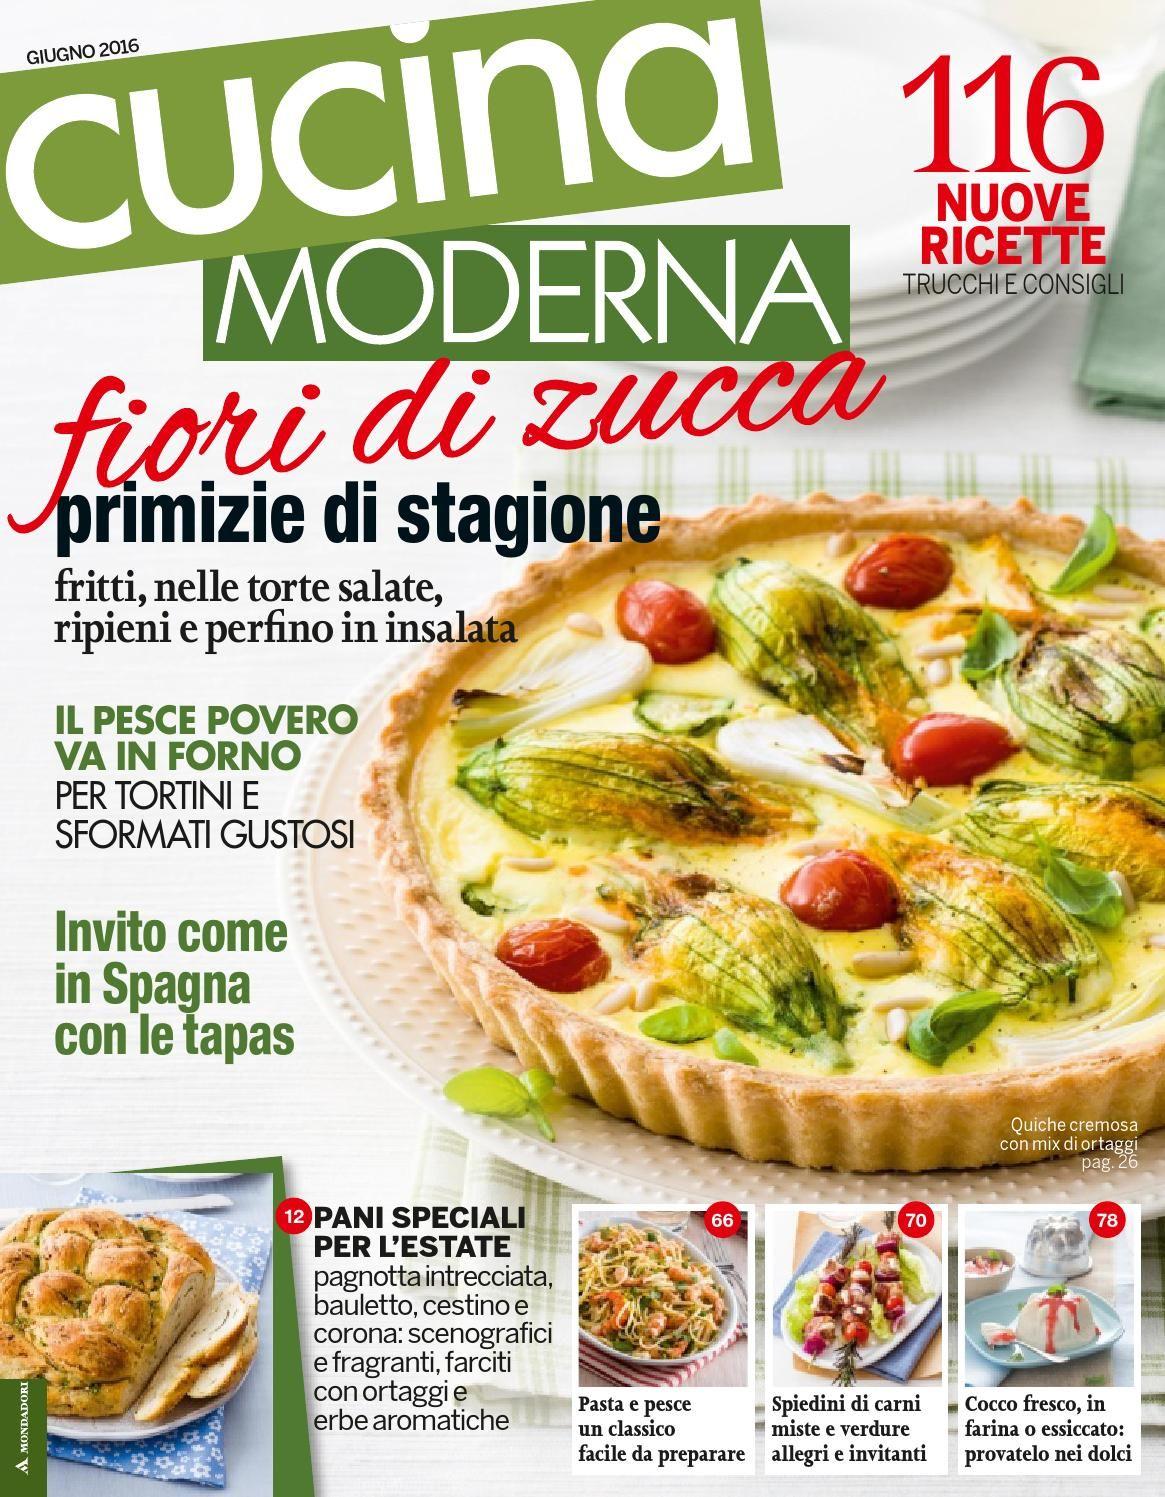 Disegno cucina moderna giugno 2015 : Cucina moderna giugno 2016 ma | Food